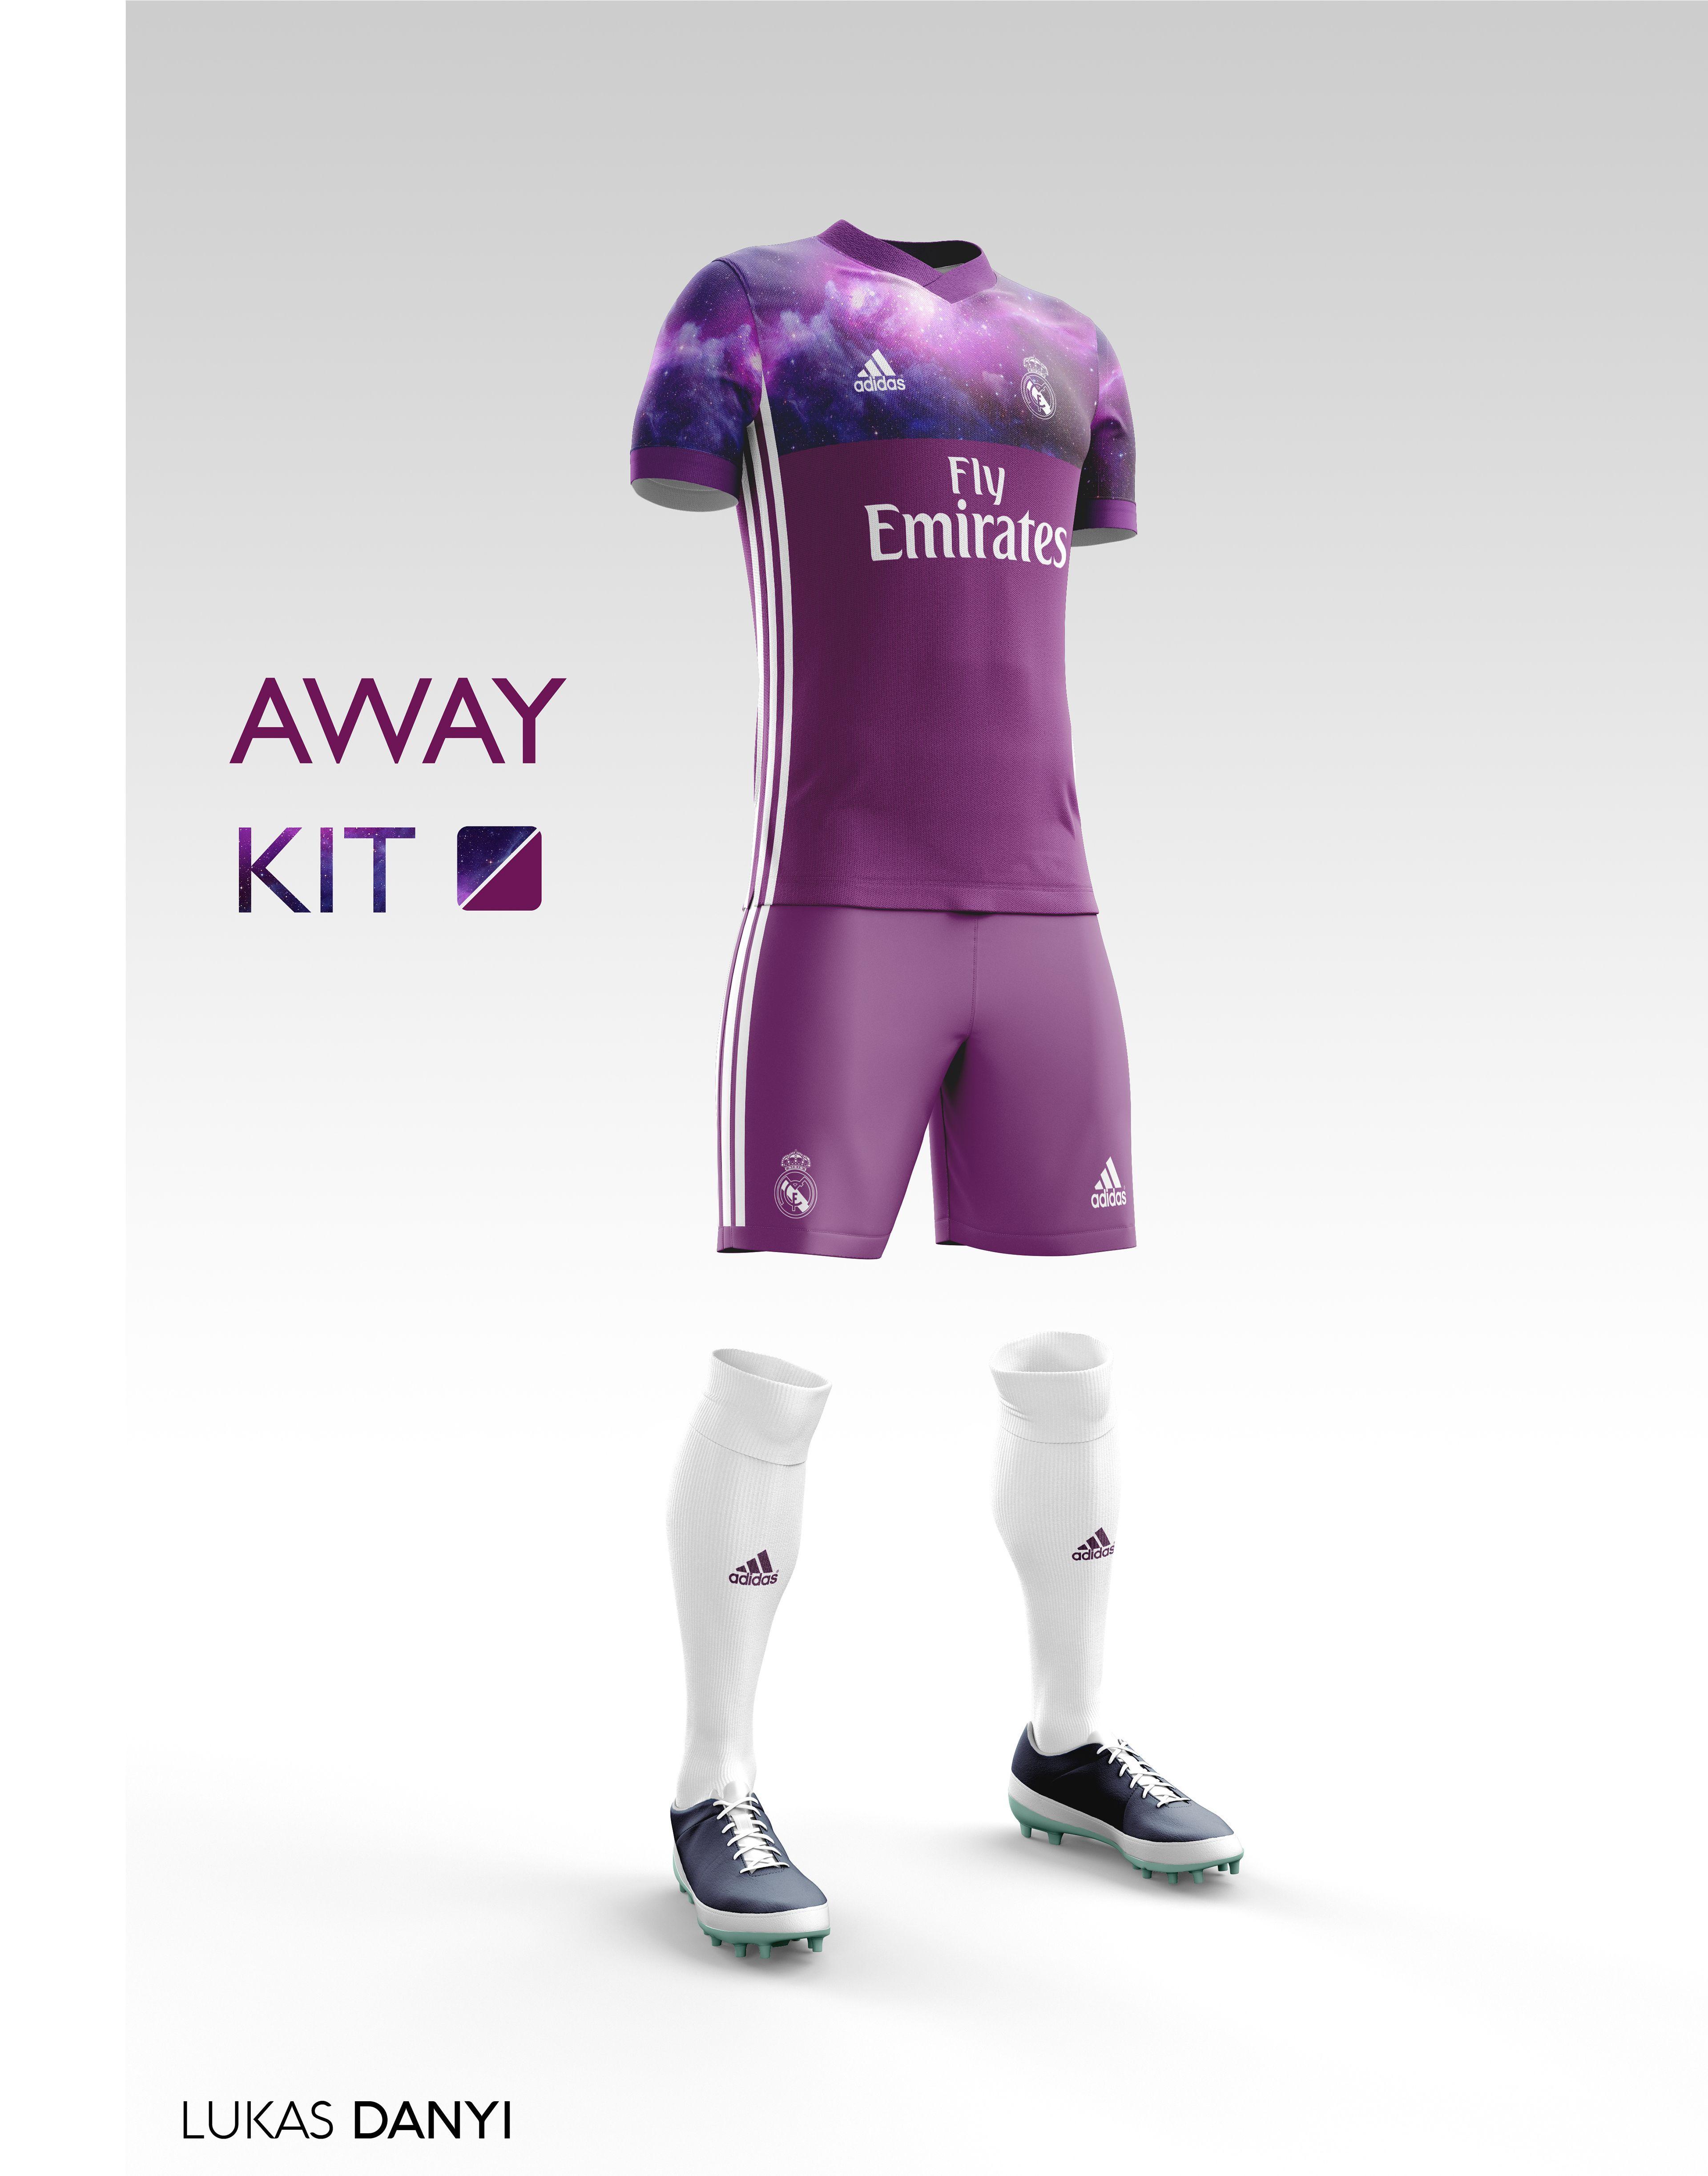 I designed football kits for Real Madrid CF for the upcoming season 16 17. e151da93efe